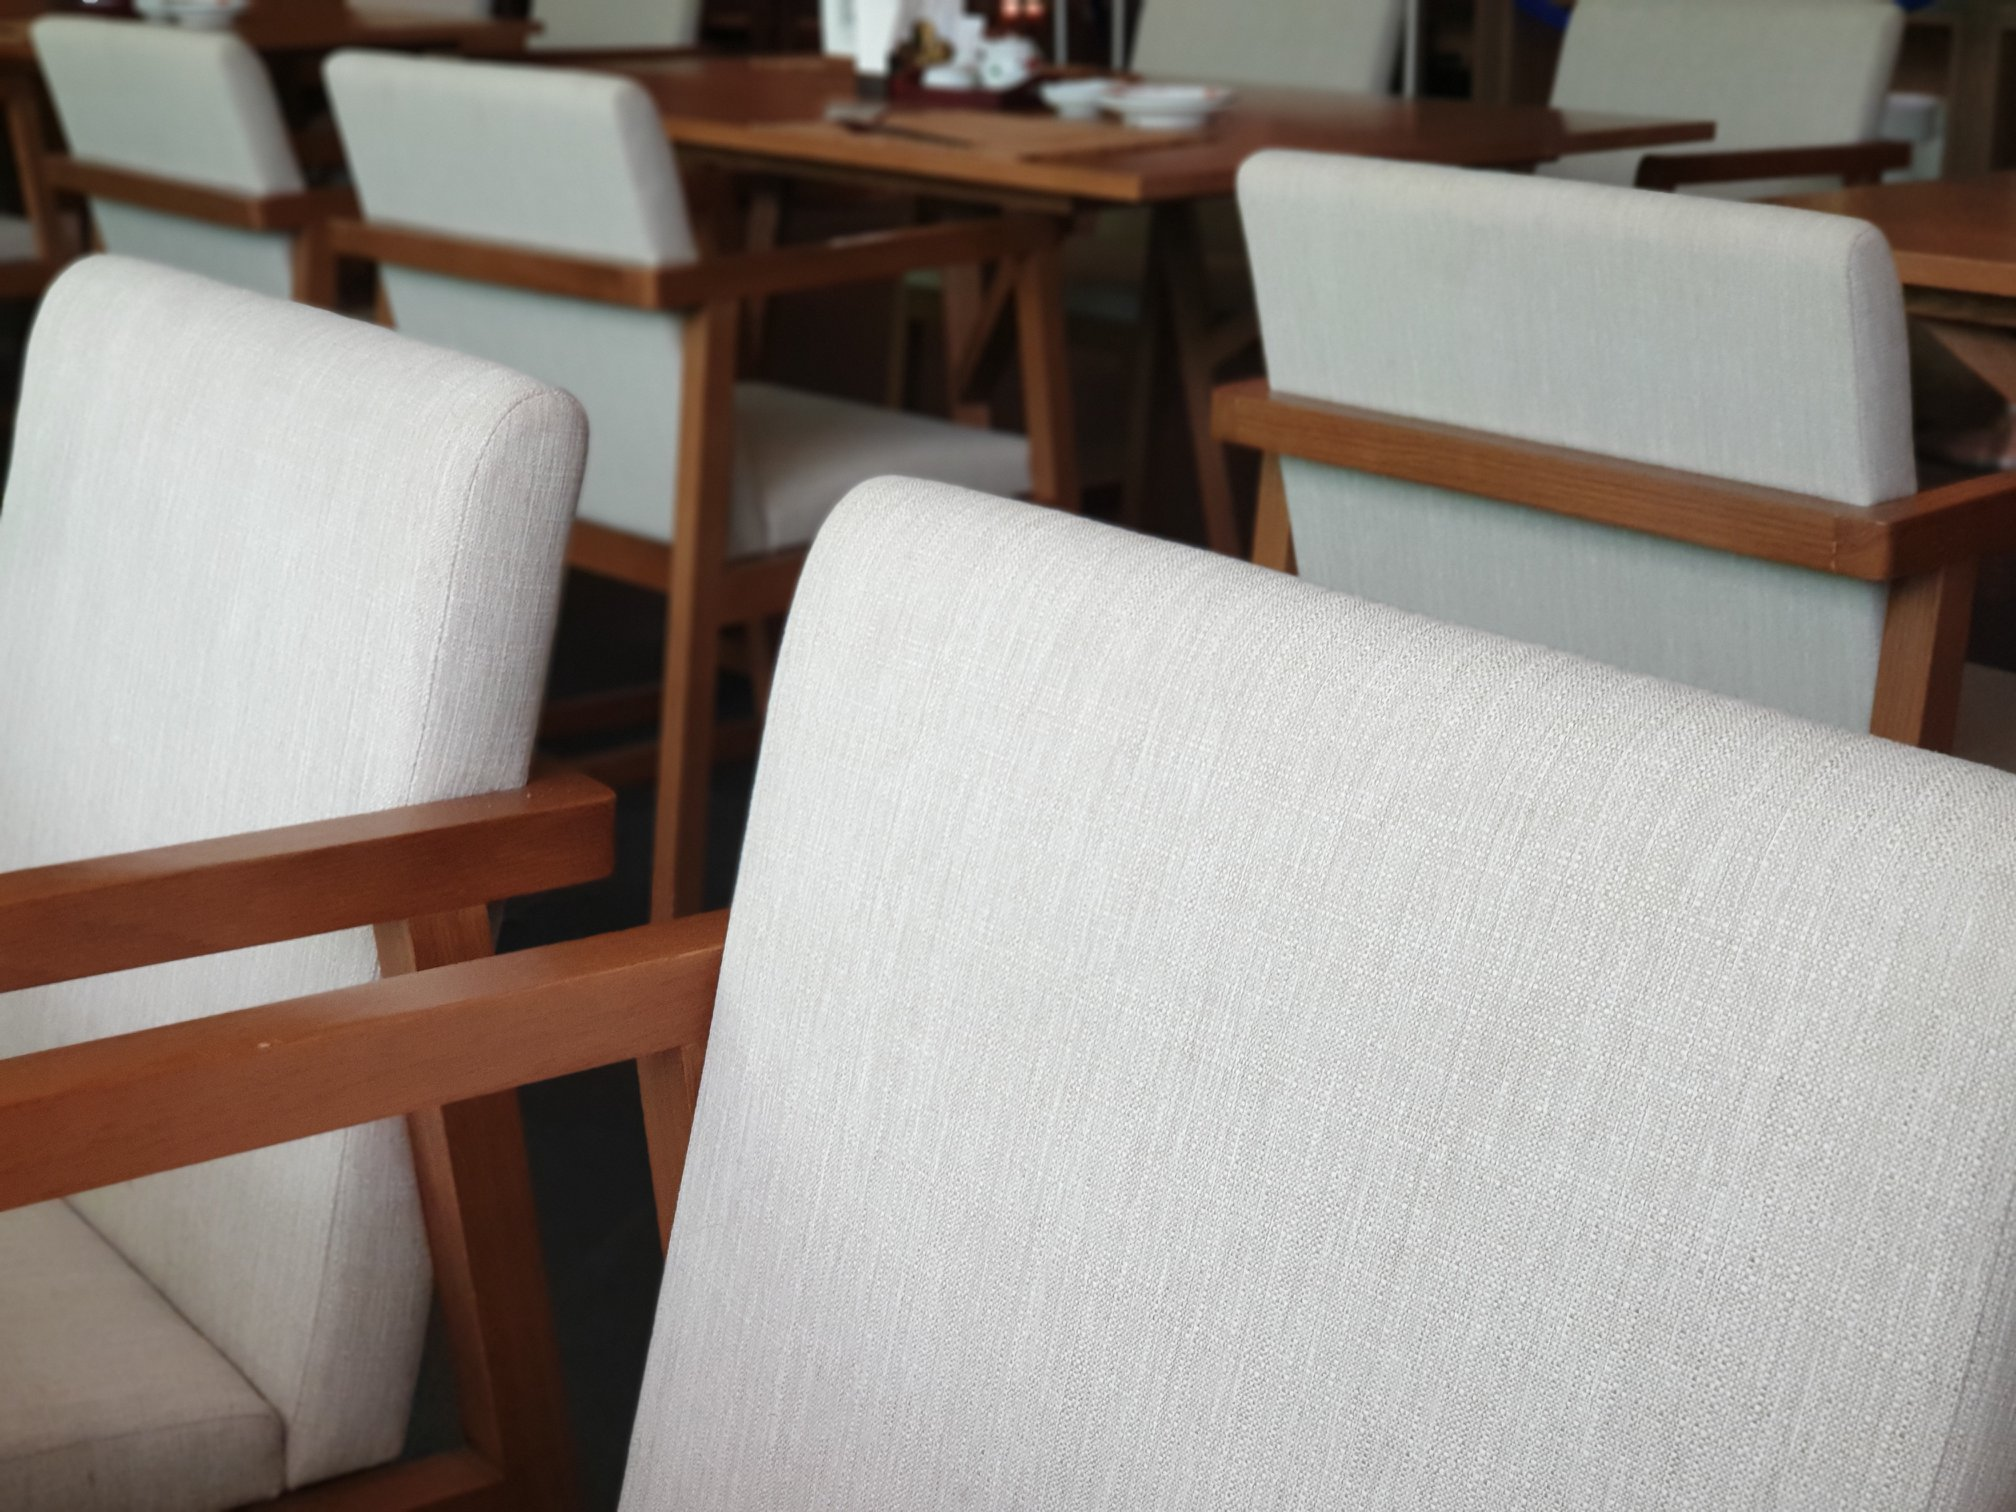 HOTEL NIKKO BANGKOK – VẢI NỘI THẤT NĂM 2020